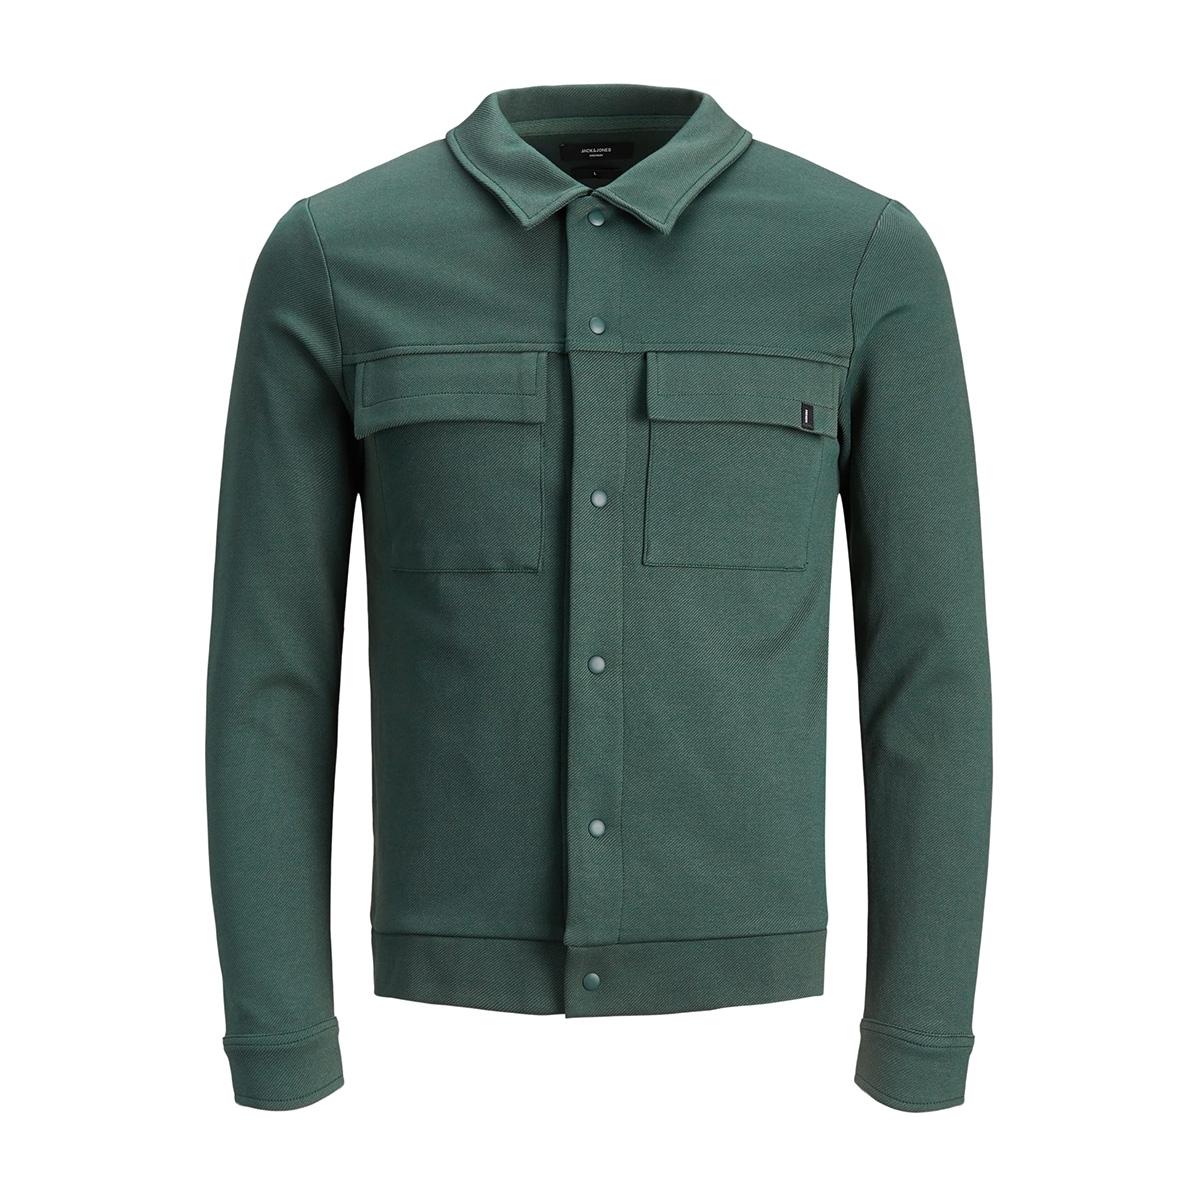 jprhal bla. sweat jacket 12159229 jack & jones jas darkest spruce/slim fit